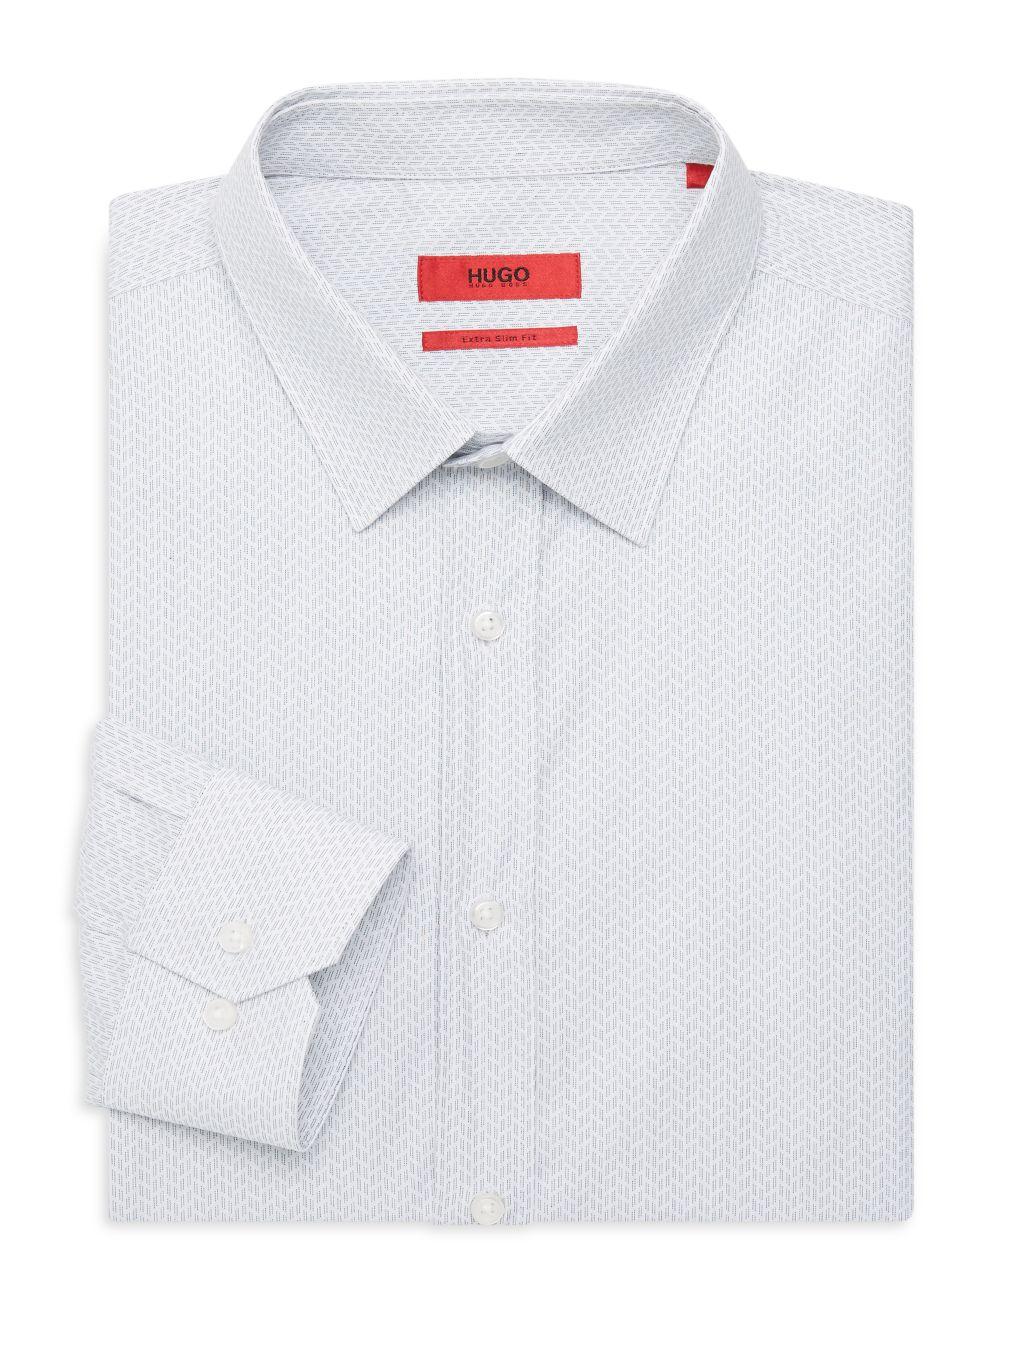 HUGO Elisha Extra Slim-Fit Cotton Shirt